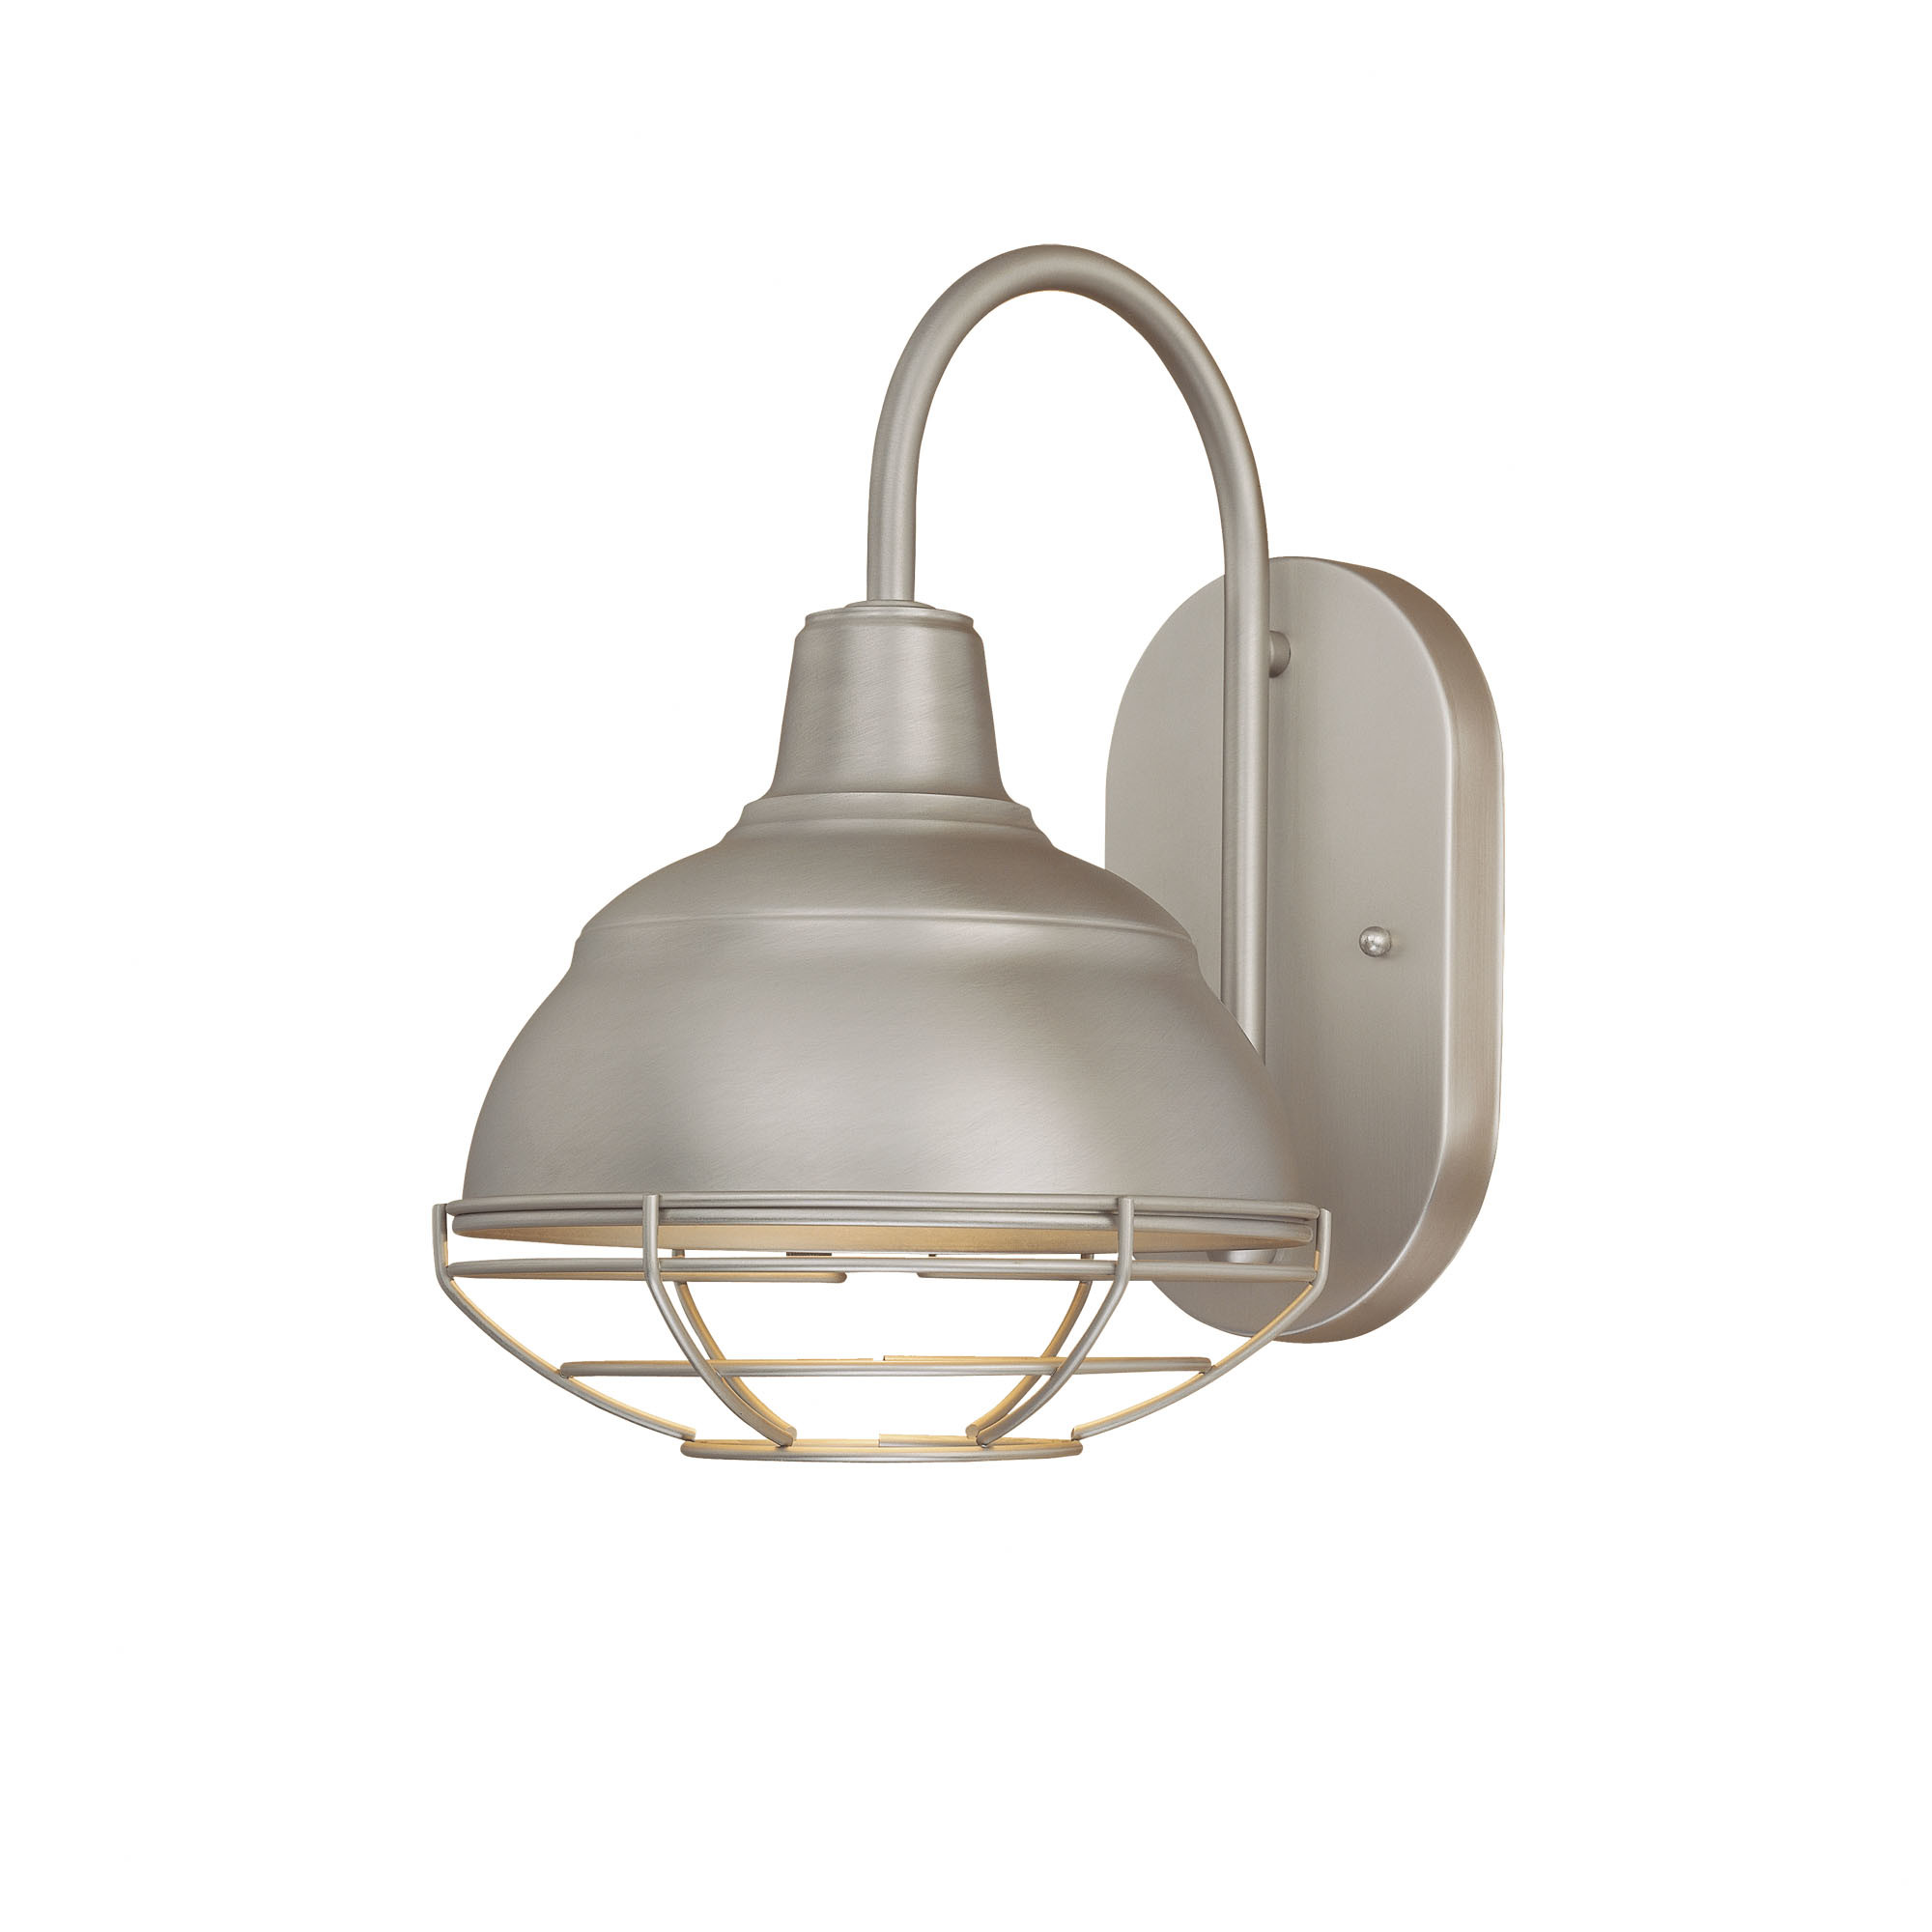 DIY Vintage Industrial Lamps for Boys Room | Five Marigolds